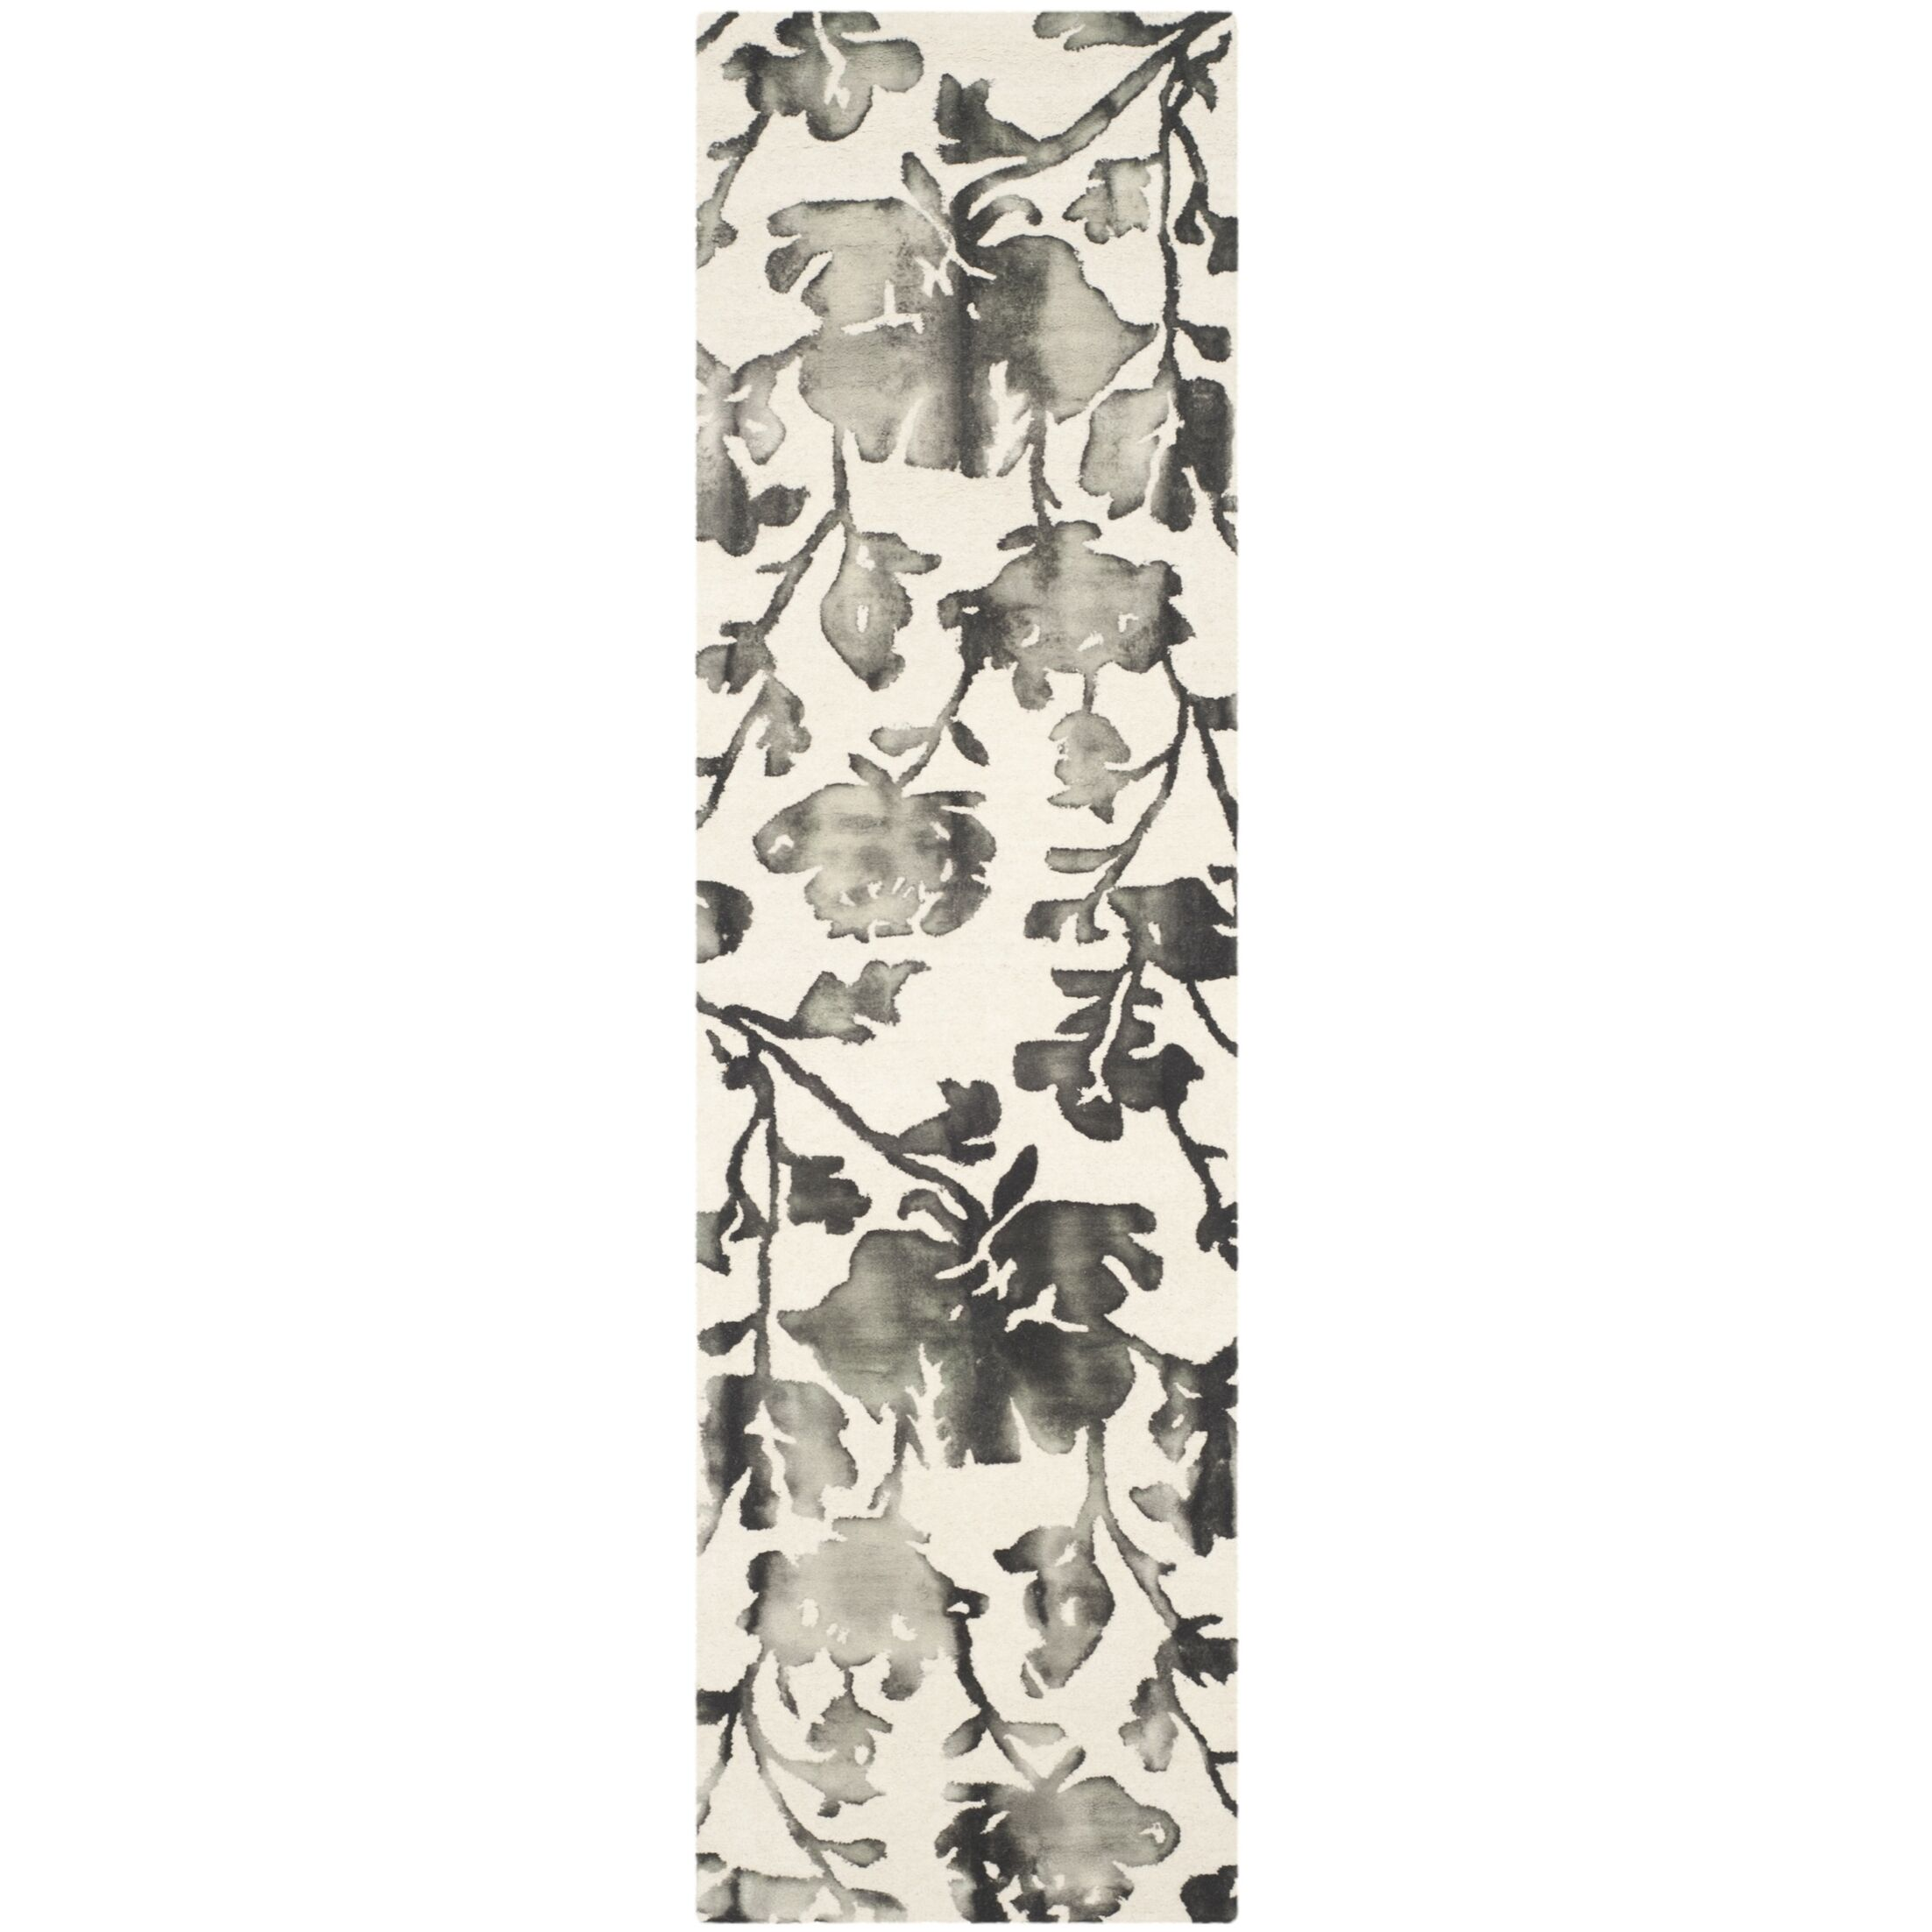 Brinkworth Hand Tufted Wool Ivory/Charcoal Area Rug Rug Size: Runner 2'3